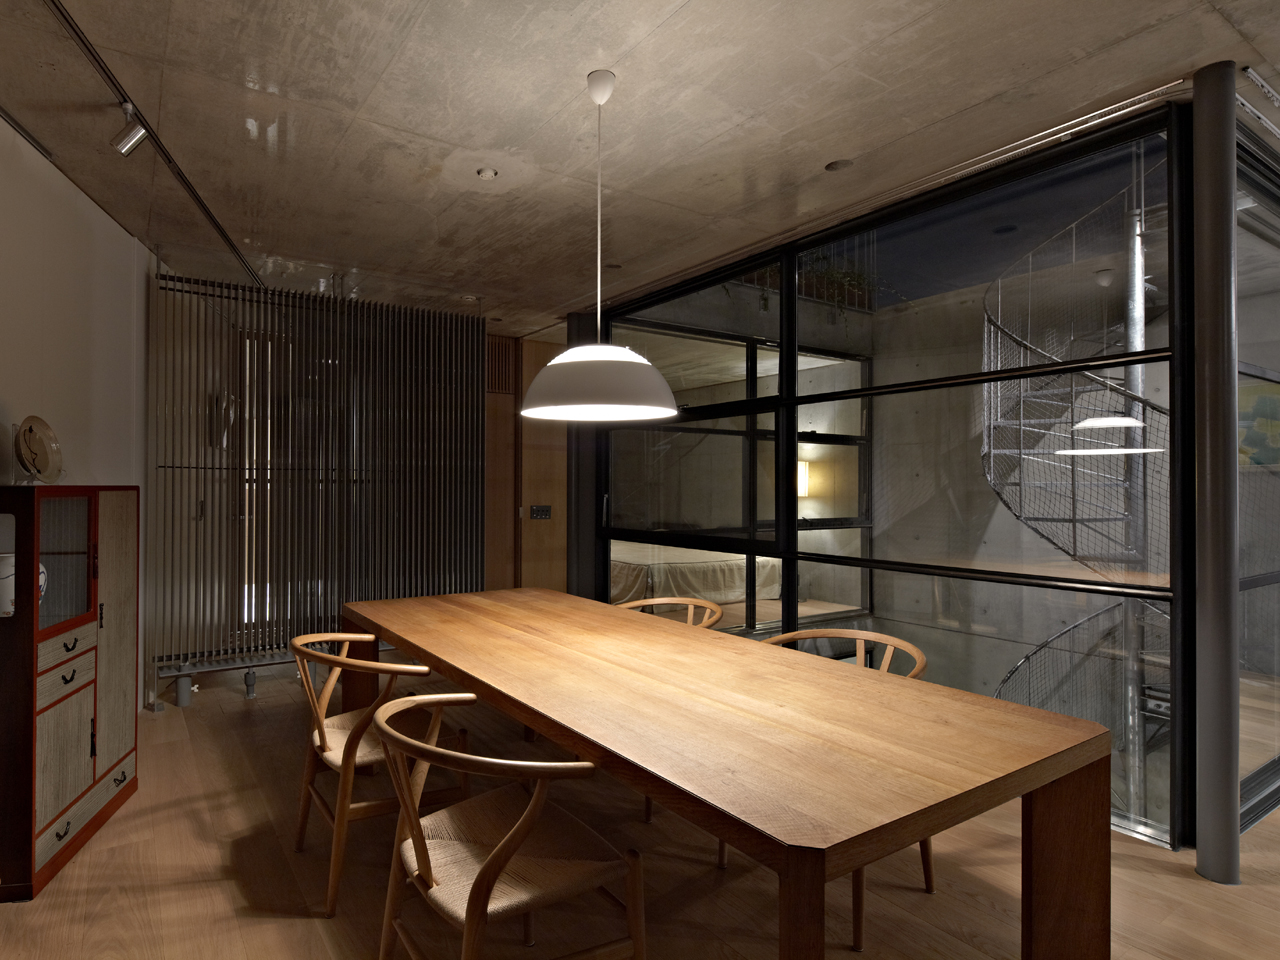 Gallery of sky garden house keiji ashizawa design 2 - Residence contemporaine sky garden keiji ashizawa design ...